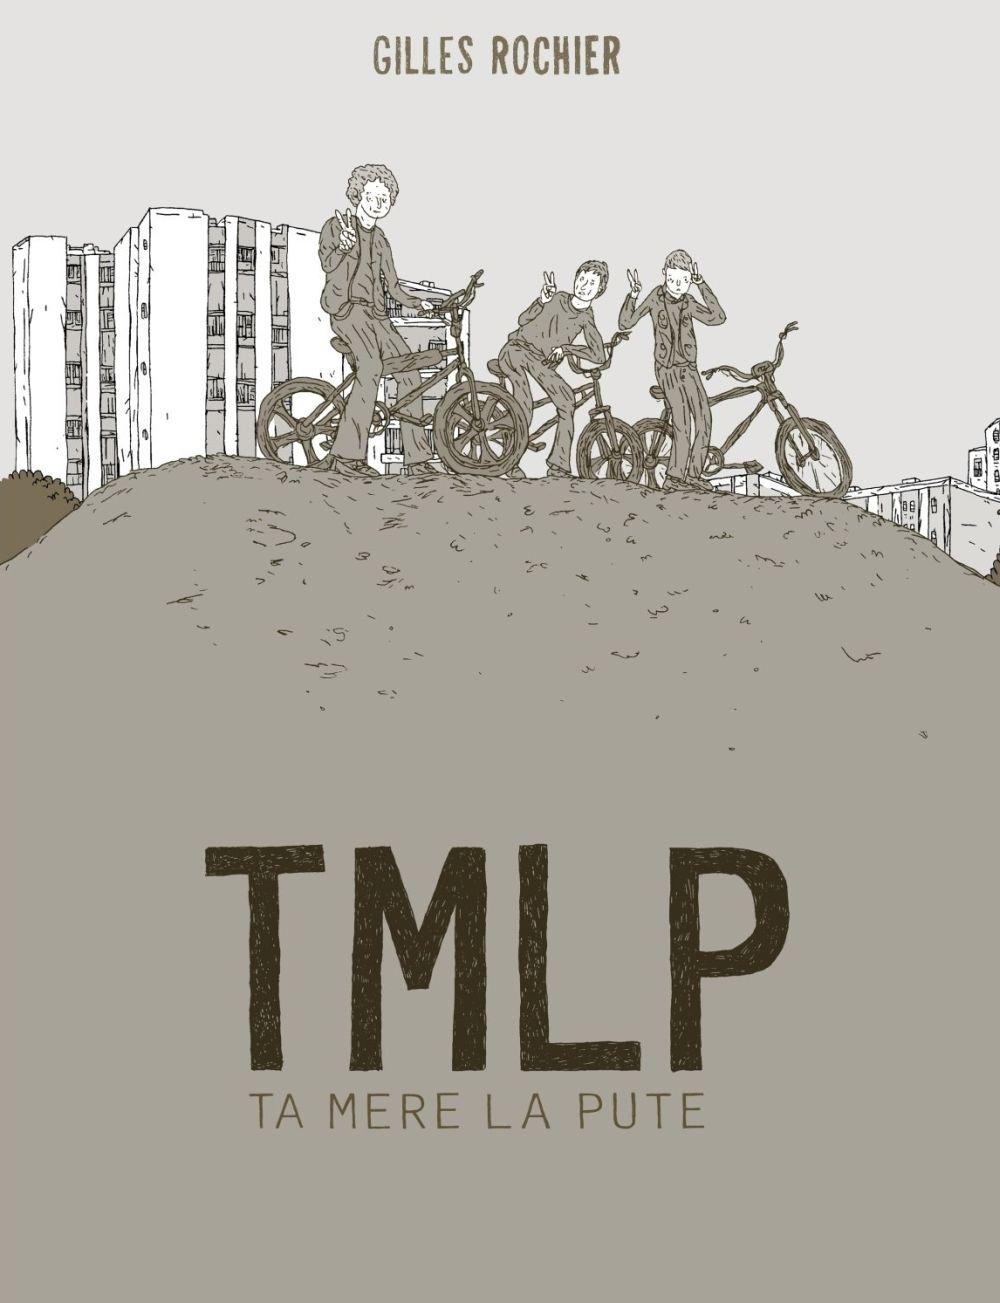 Gilles Rochier TMLP